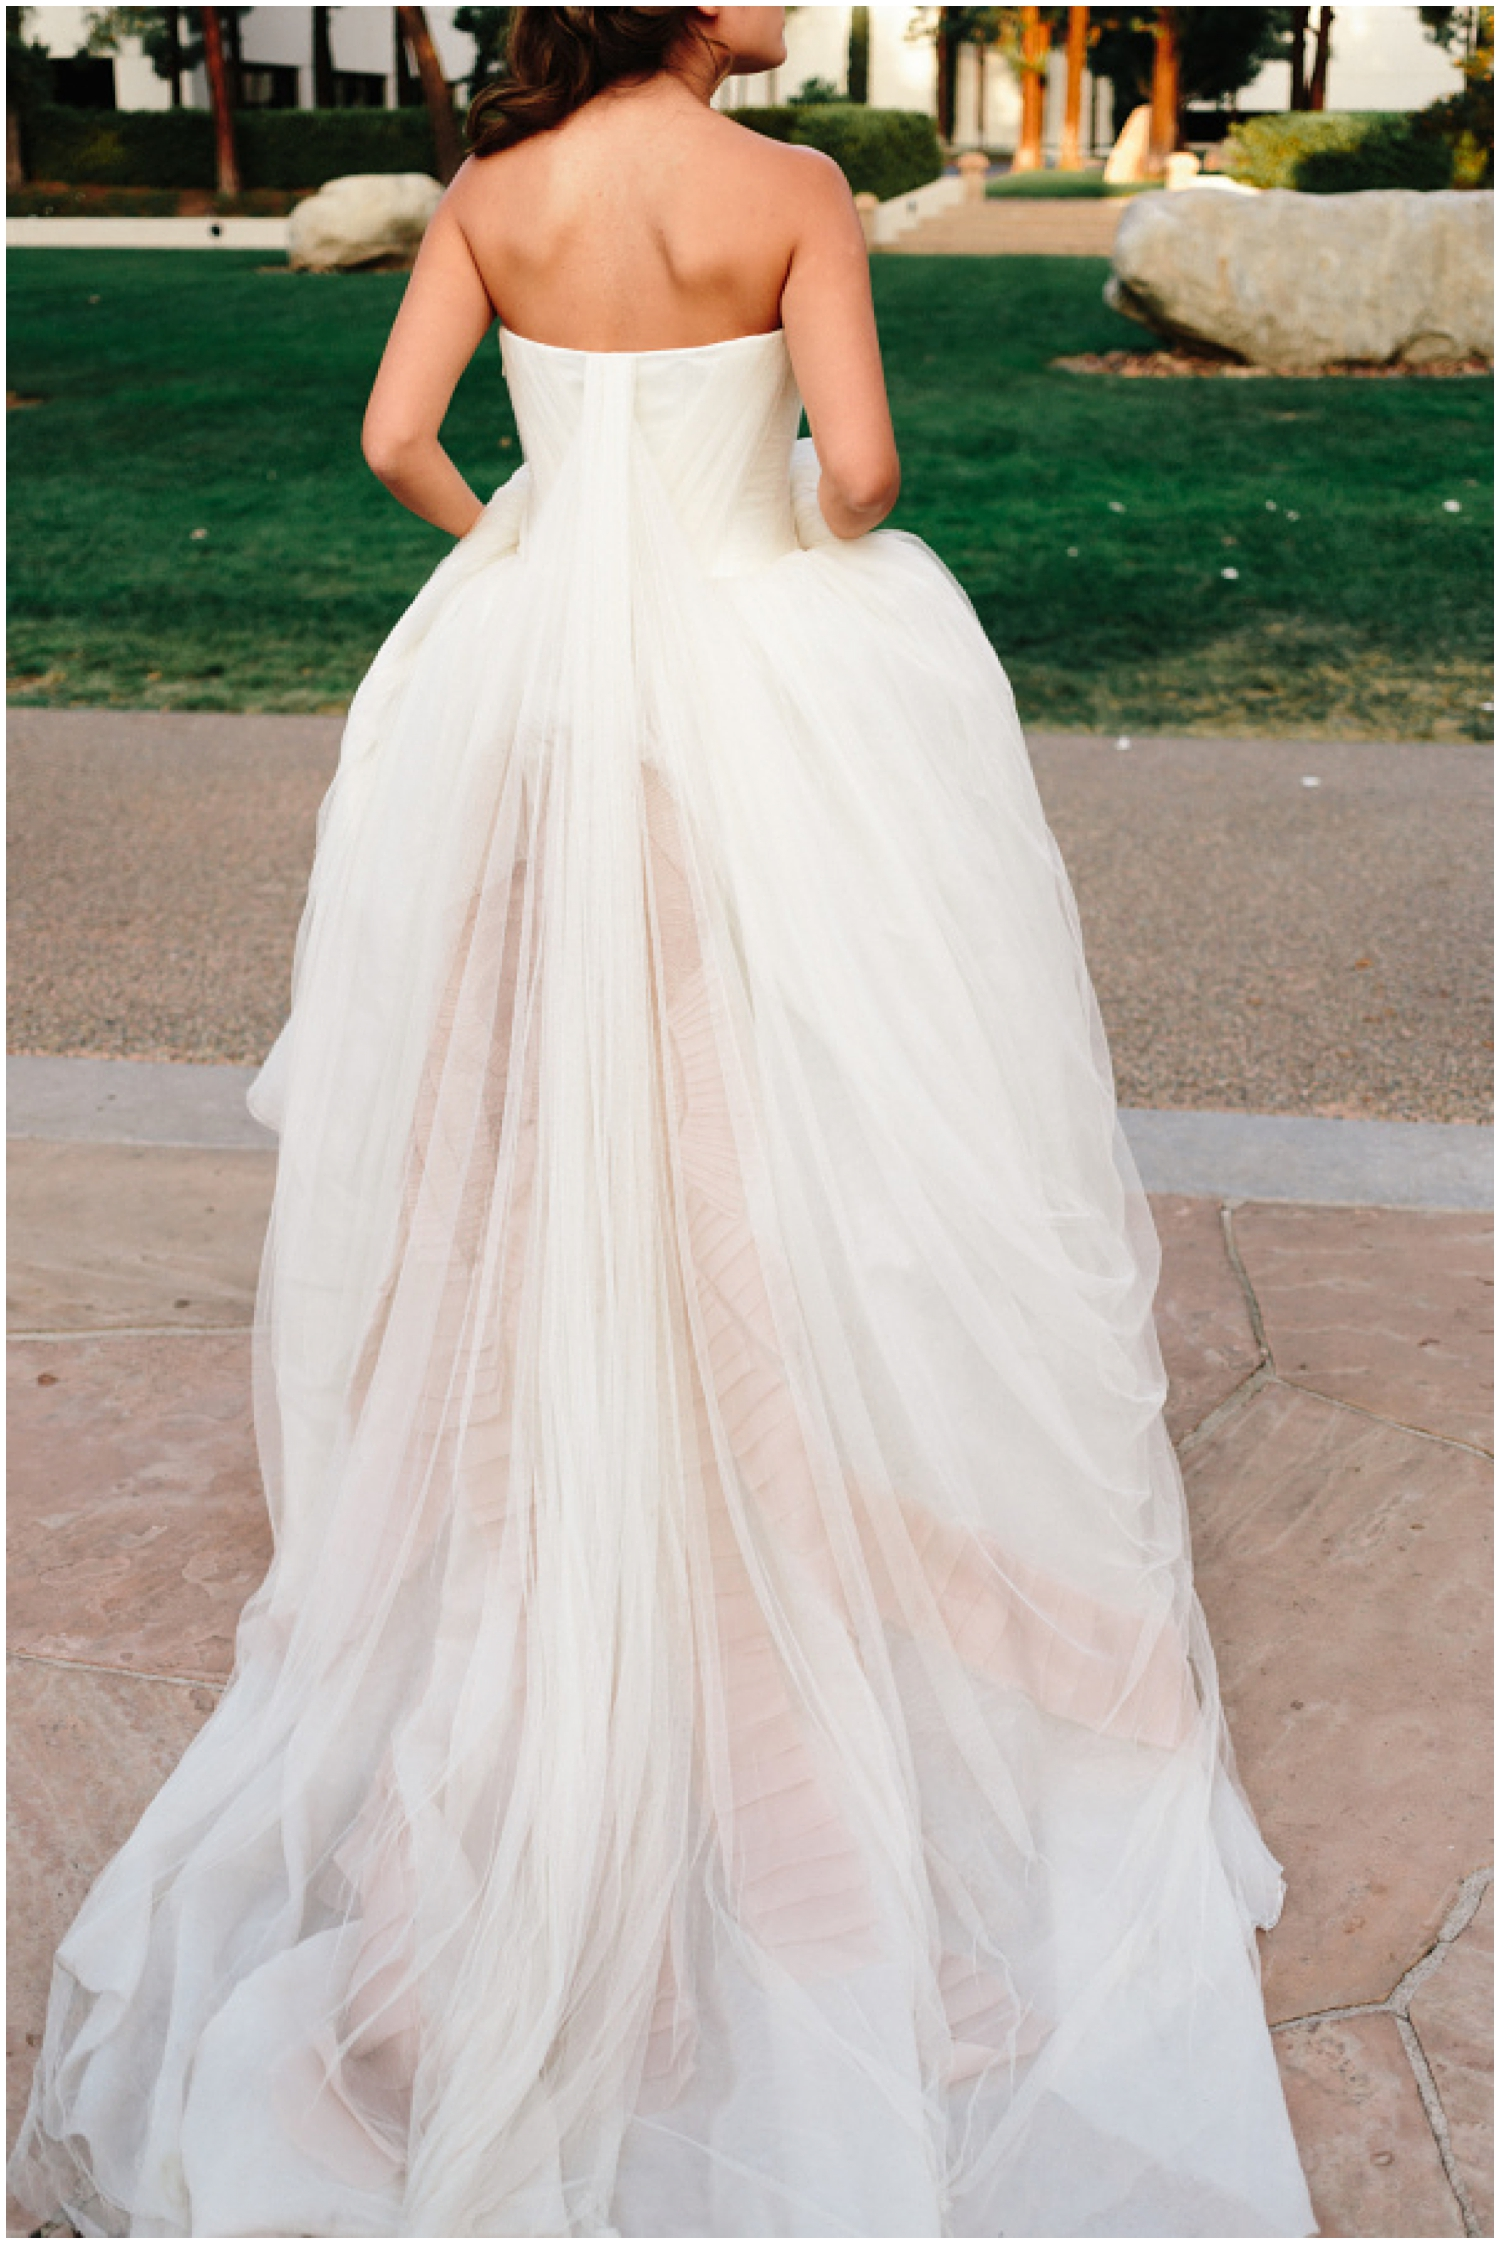 Vera Wang Wedding Dress as seen on  Style Me Pretty  | Photo by  Joel Bedford